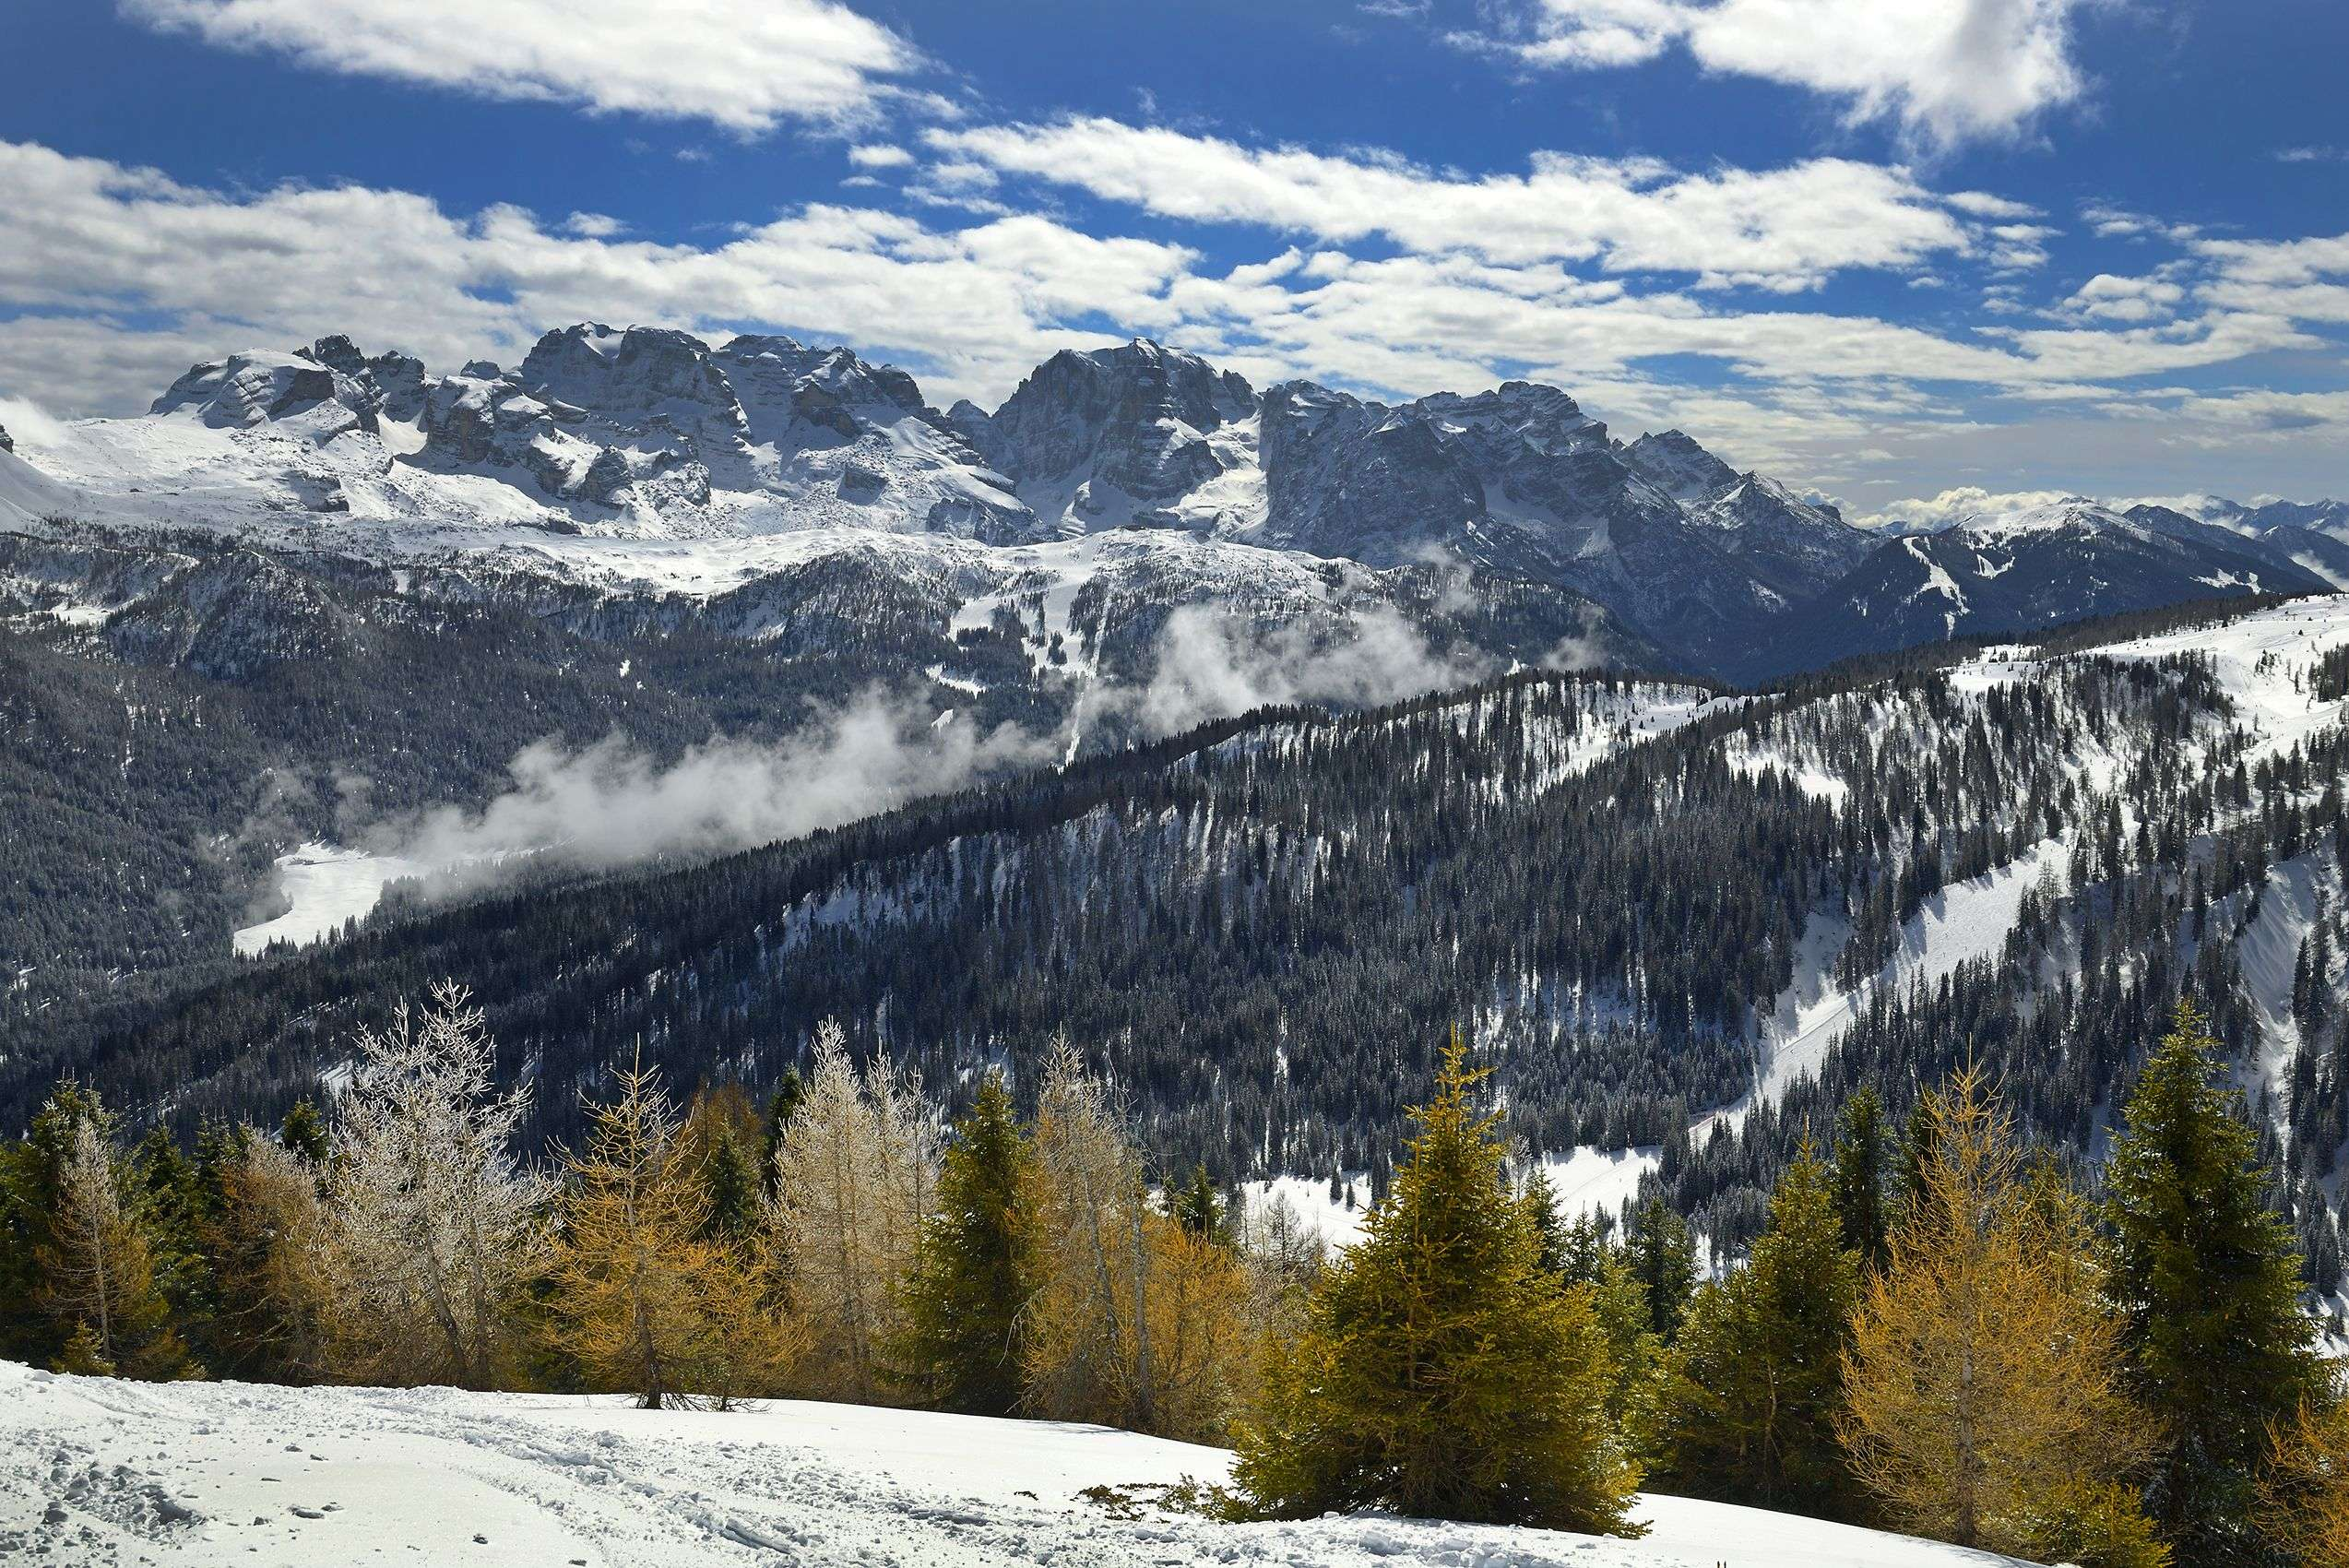 https://bsl.com.mt/wp-content/uploads/2021/09/Dolomites-New-1.jpg